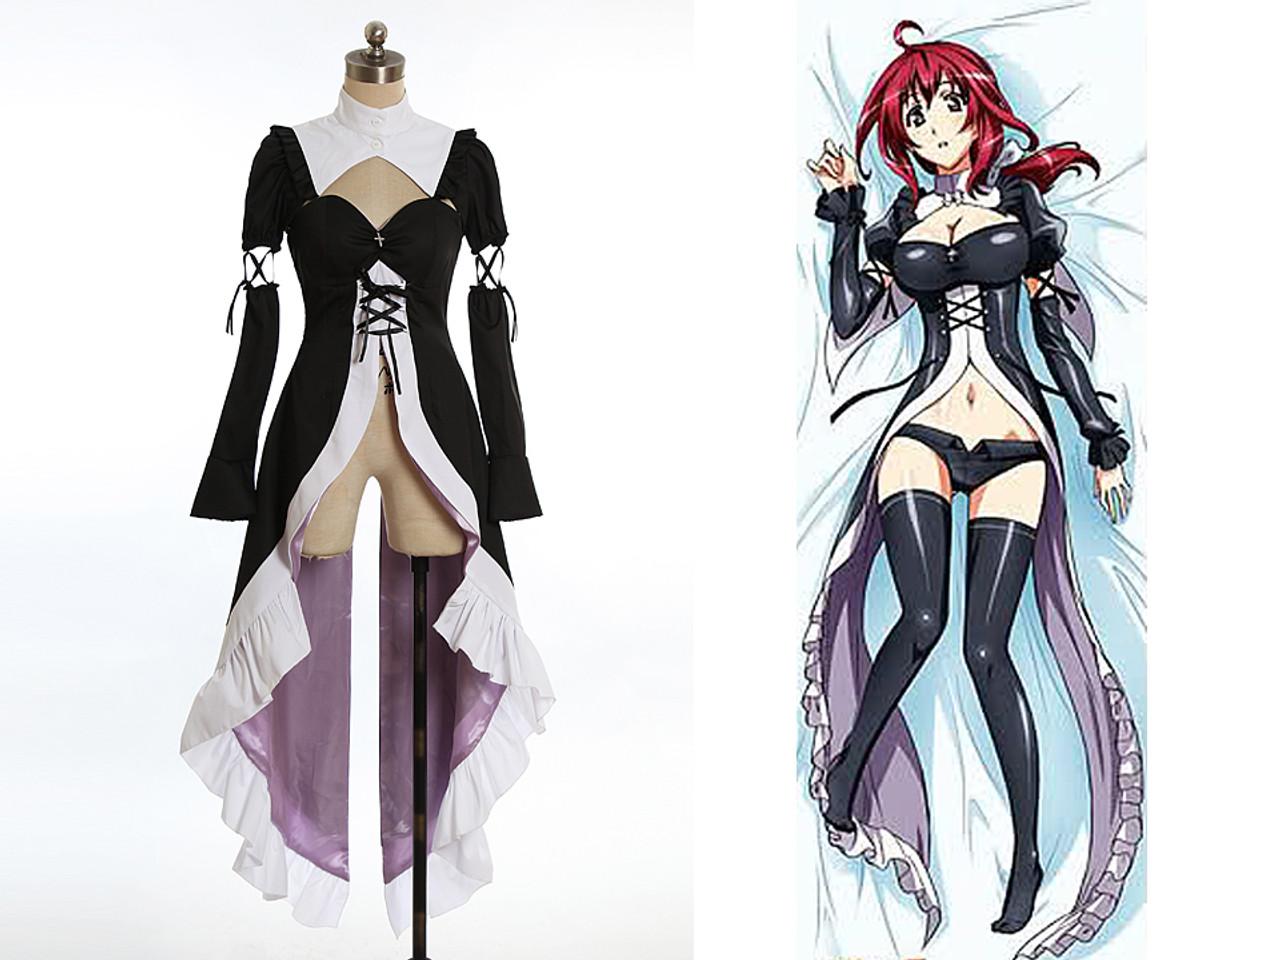 qwaser Seikon cosplay no